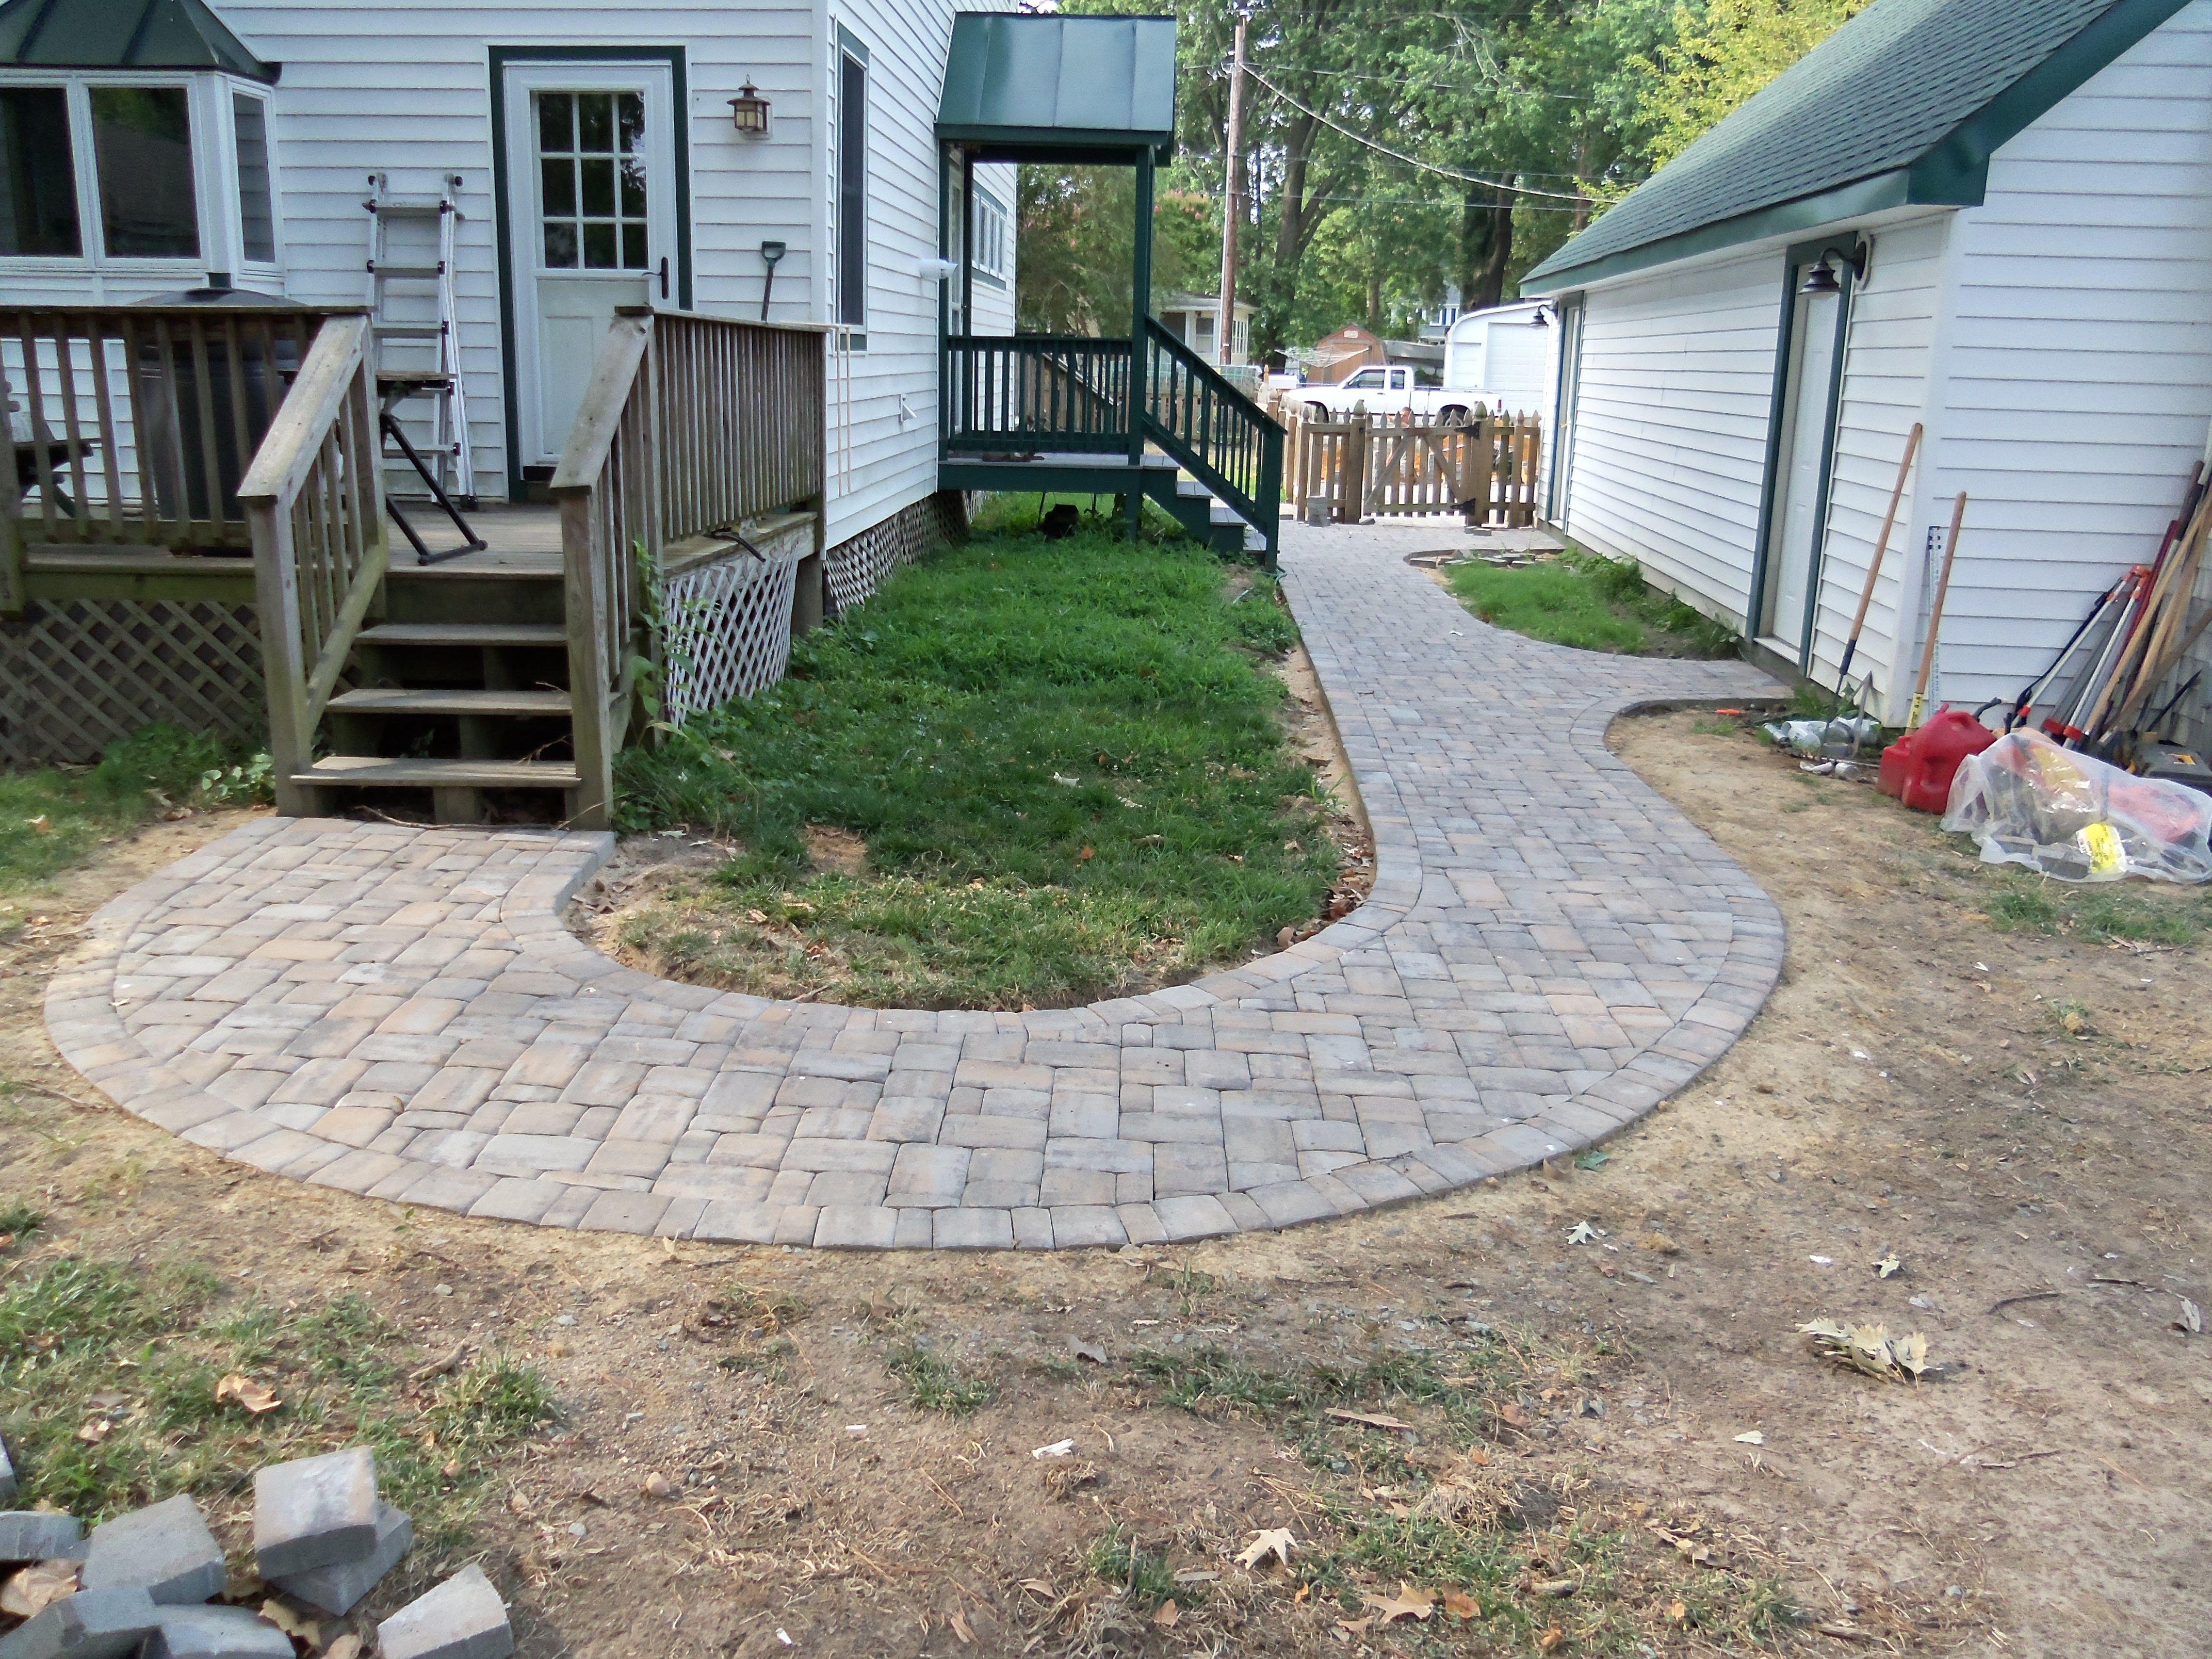 Attirant Brick Paver Walkway Designs | Brick Paver Patios And Walkways